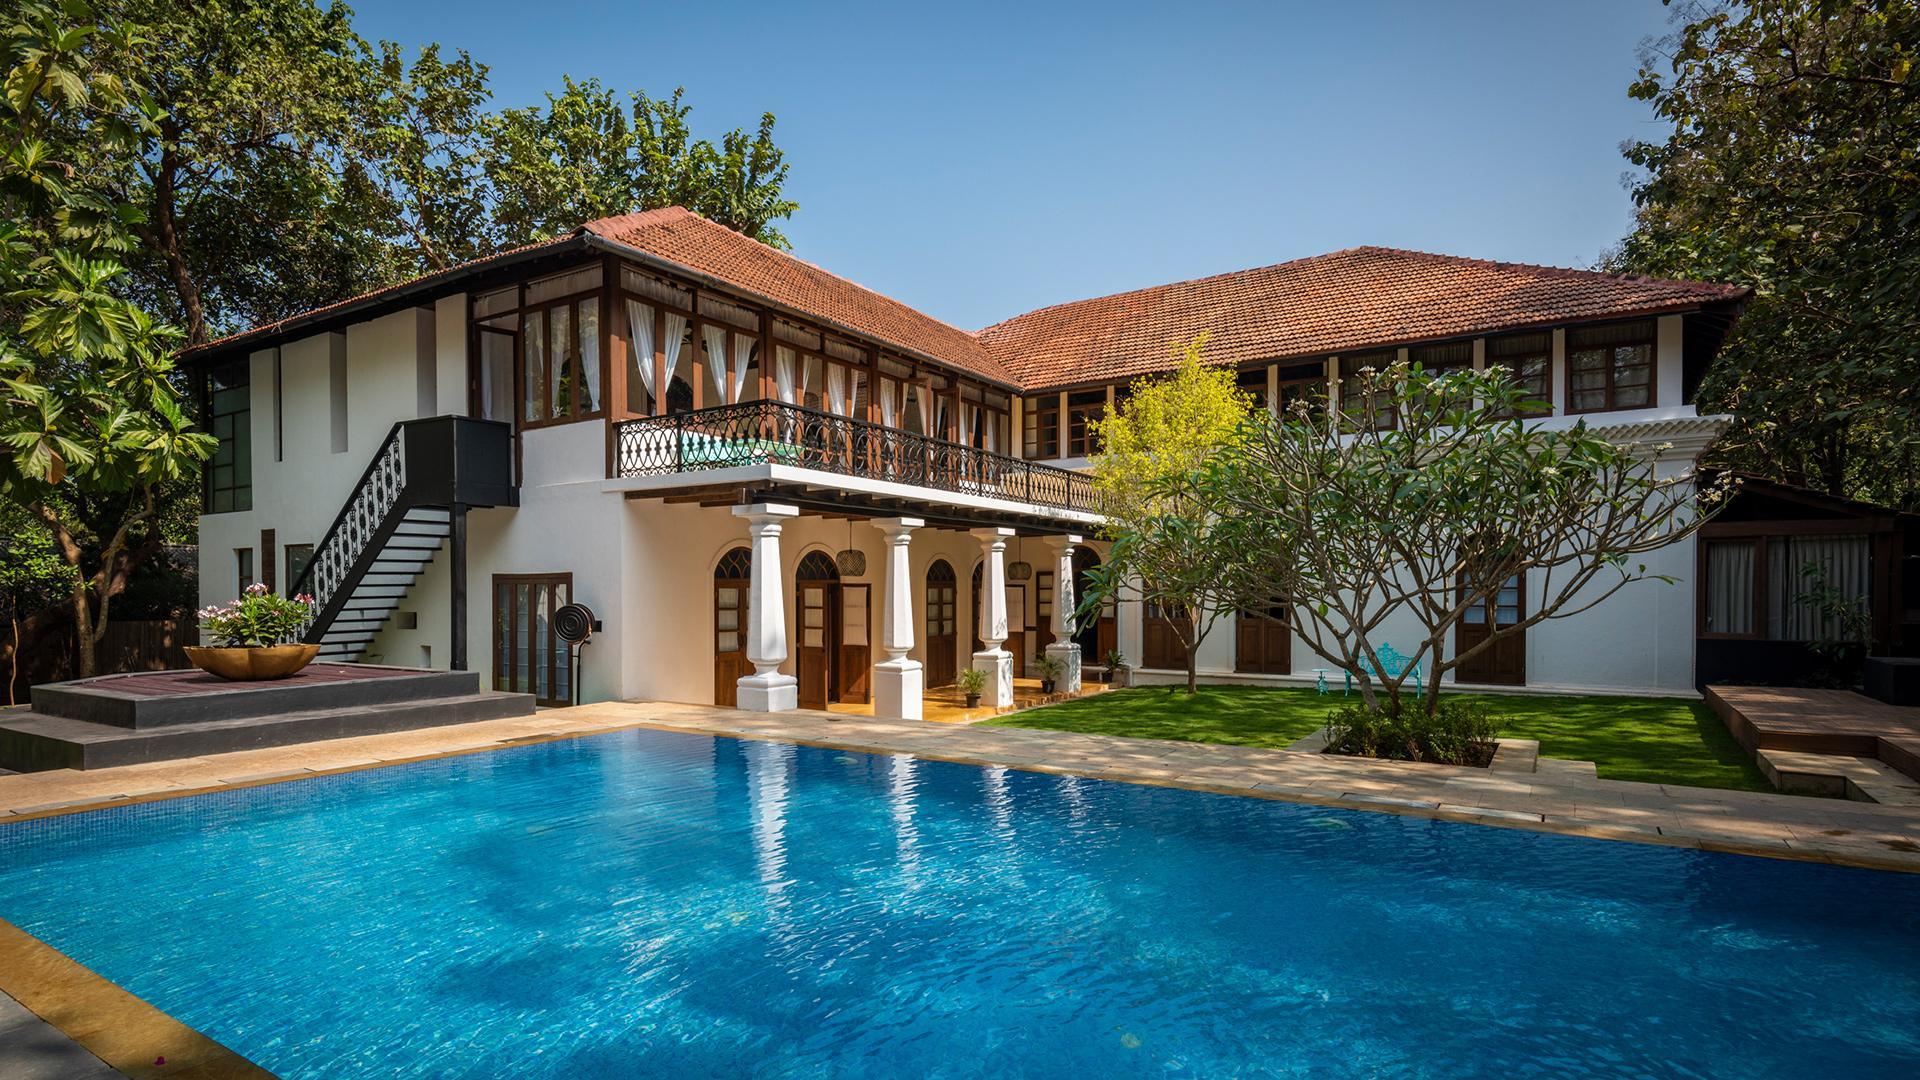 The Postcard Moira — North Goa — Luxury Room image 1 at The Postcard Hotels Collection by North Goa, Goa, India